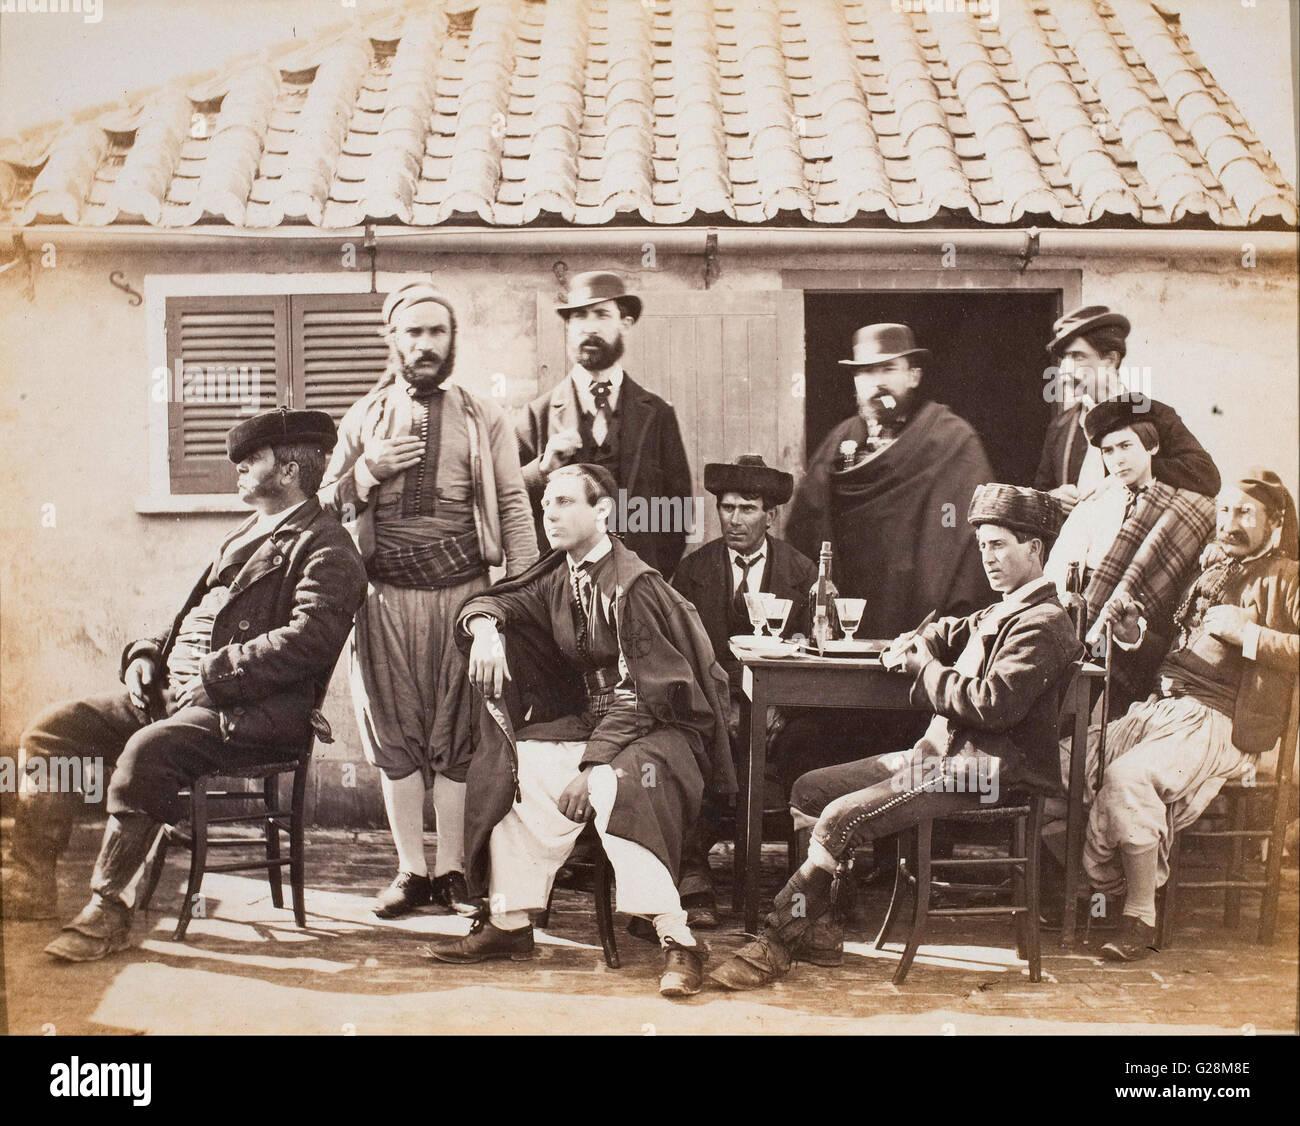 Robert Peters Napper - Gibraltar, group of smugglers  - MNAC - Barcelona - Stock Image